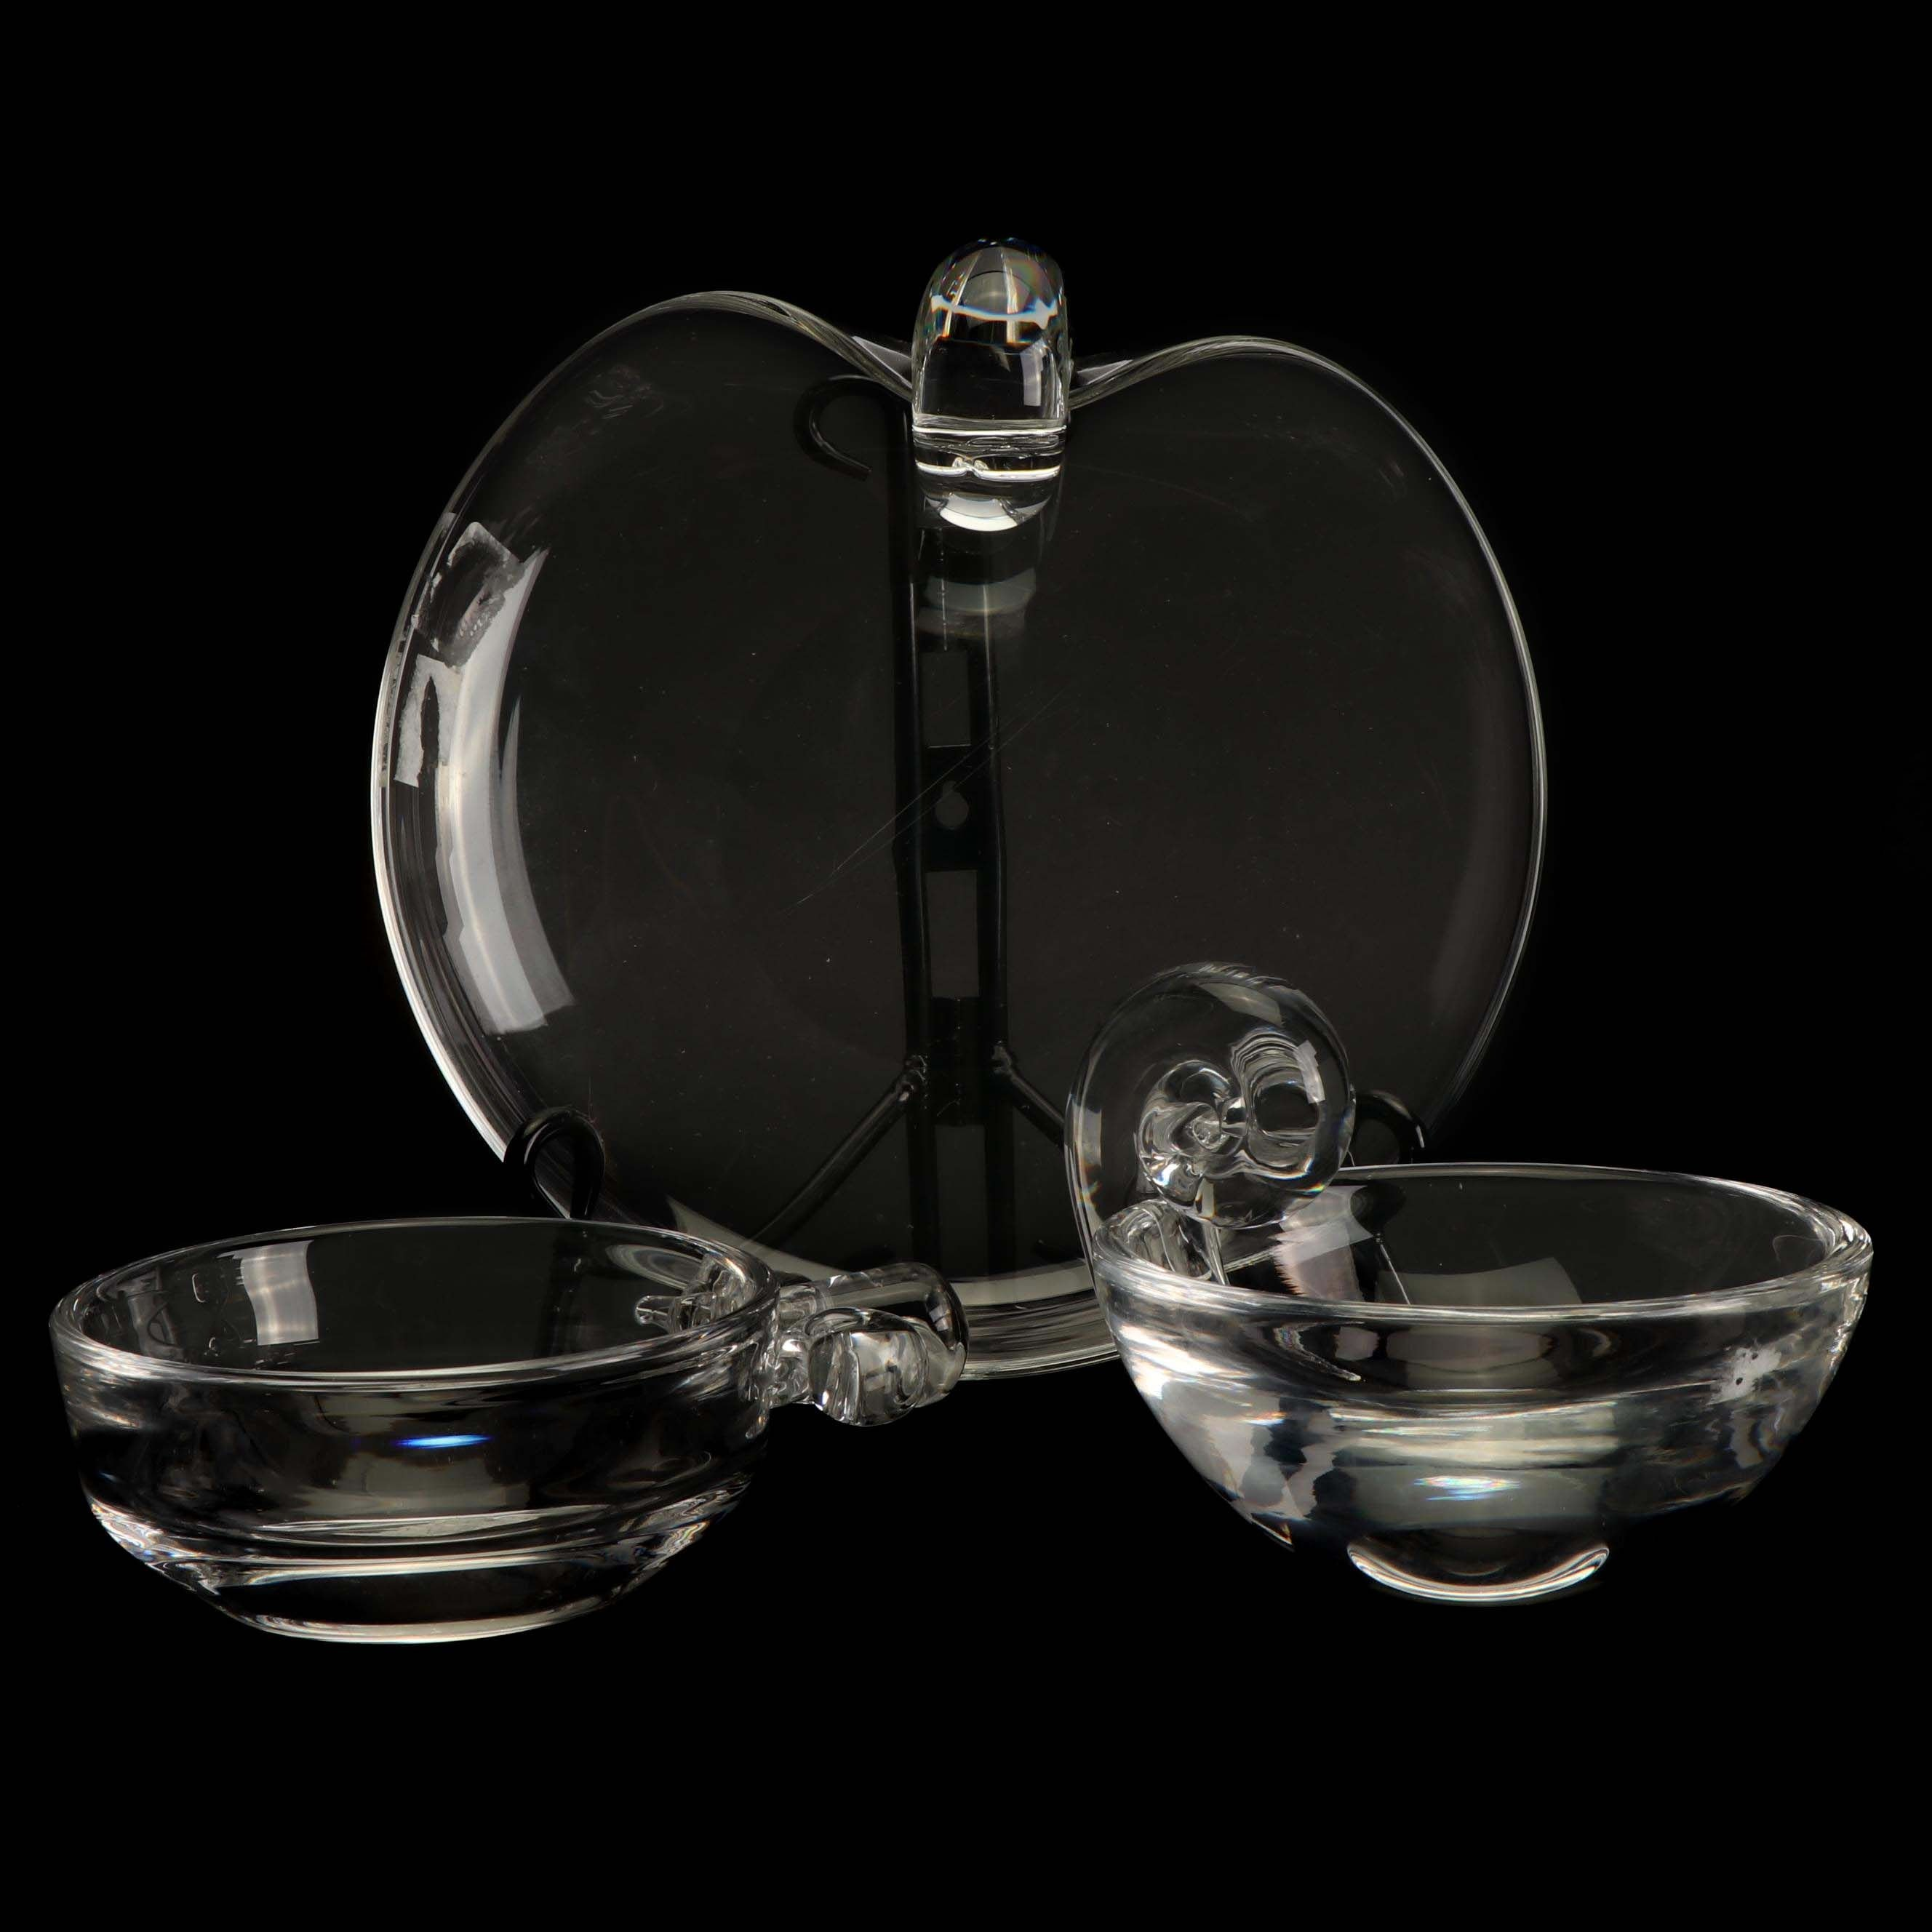 Three Steuben Glass Bowls